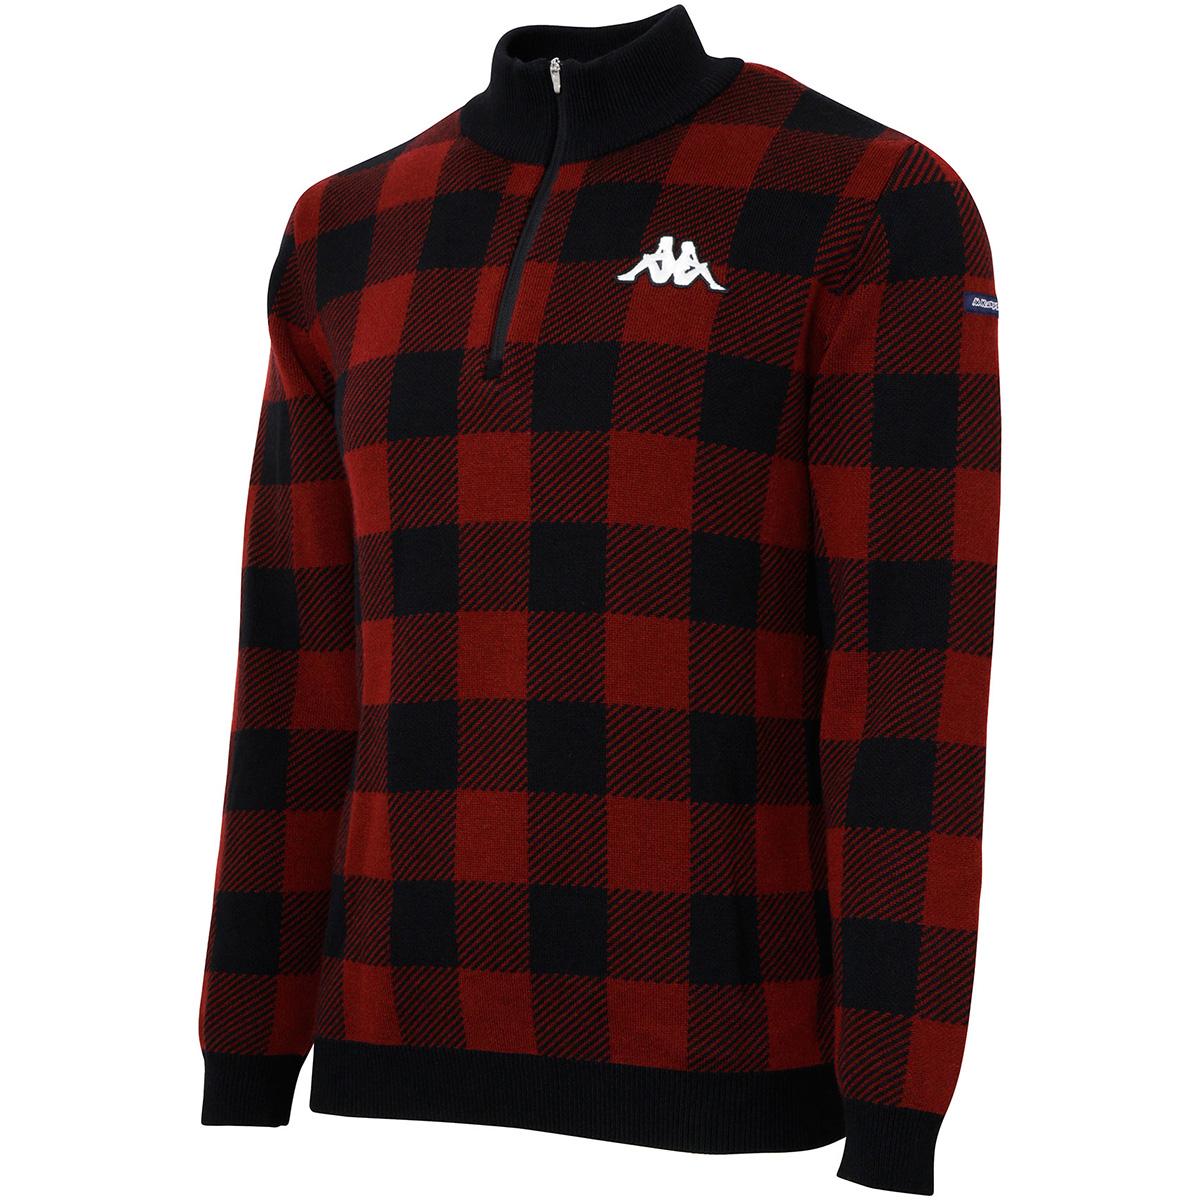 Kappa GOLF バッファローチェックハーフジップセーター